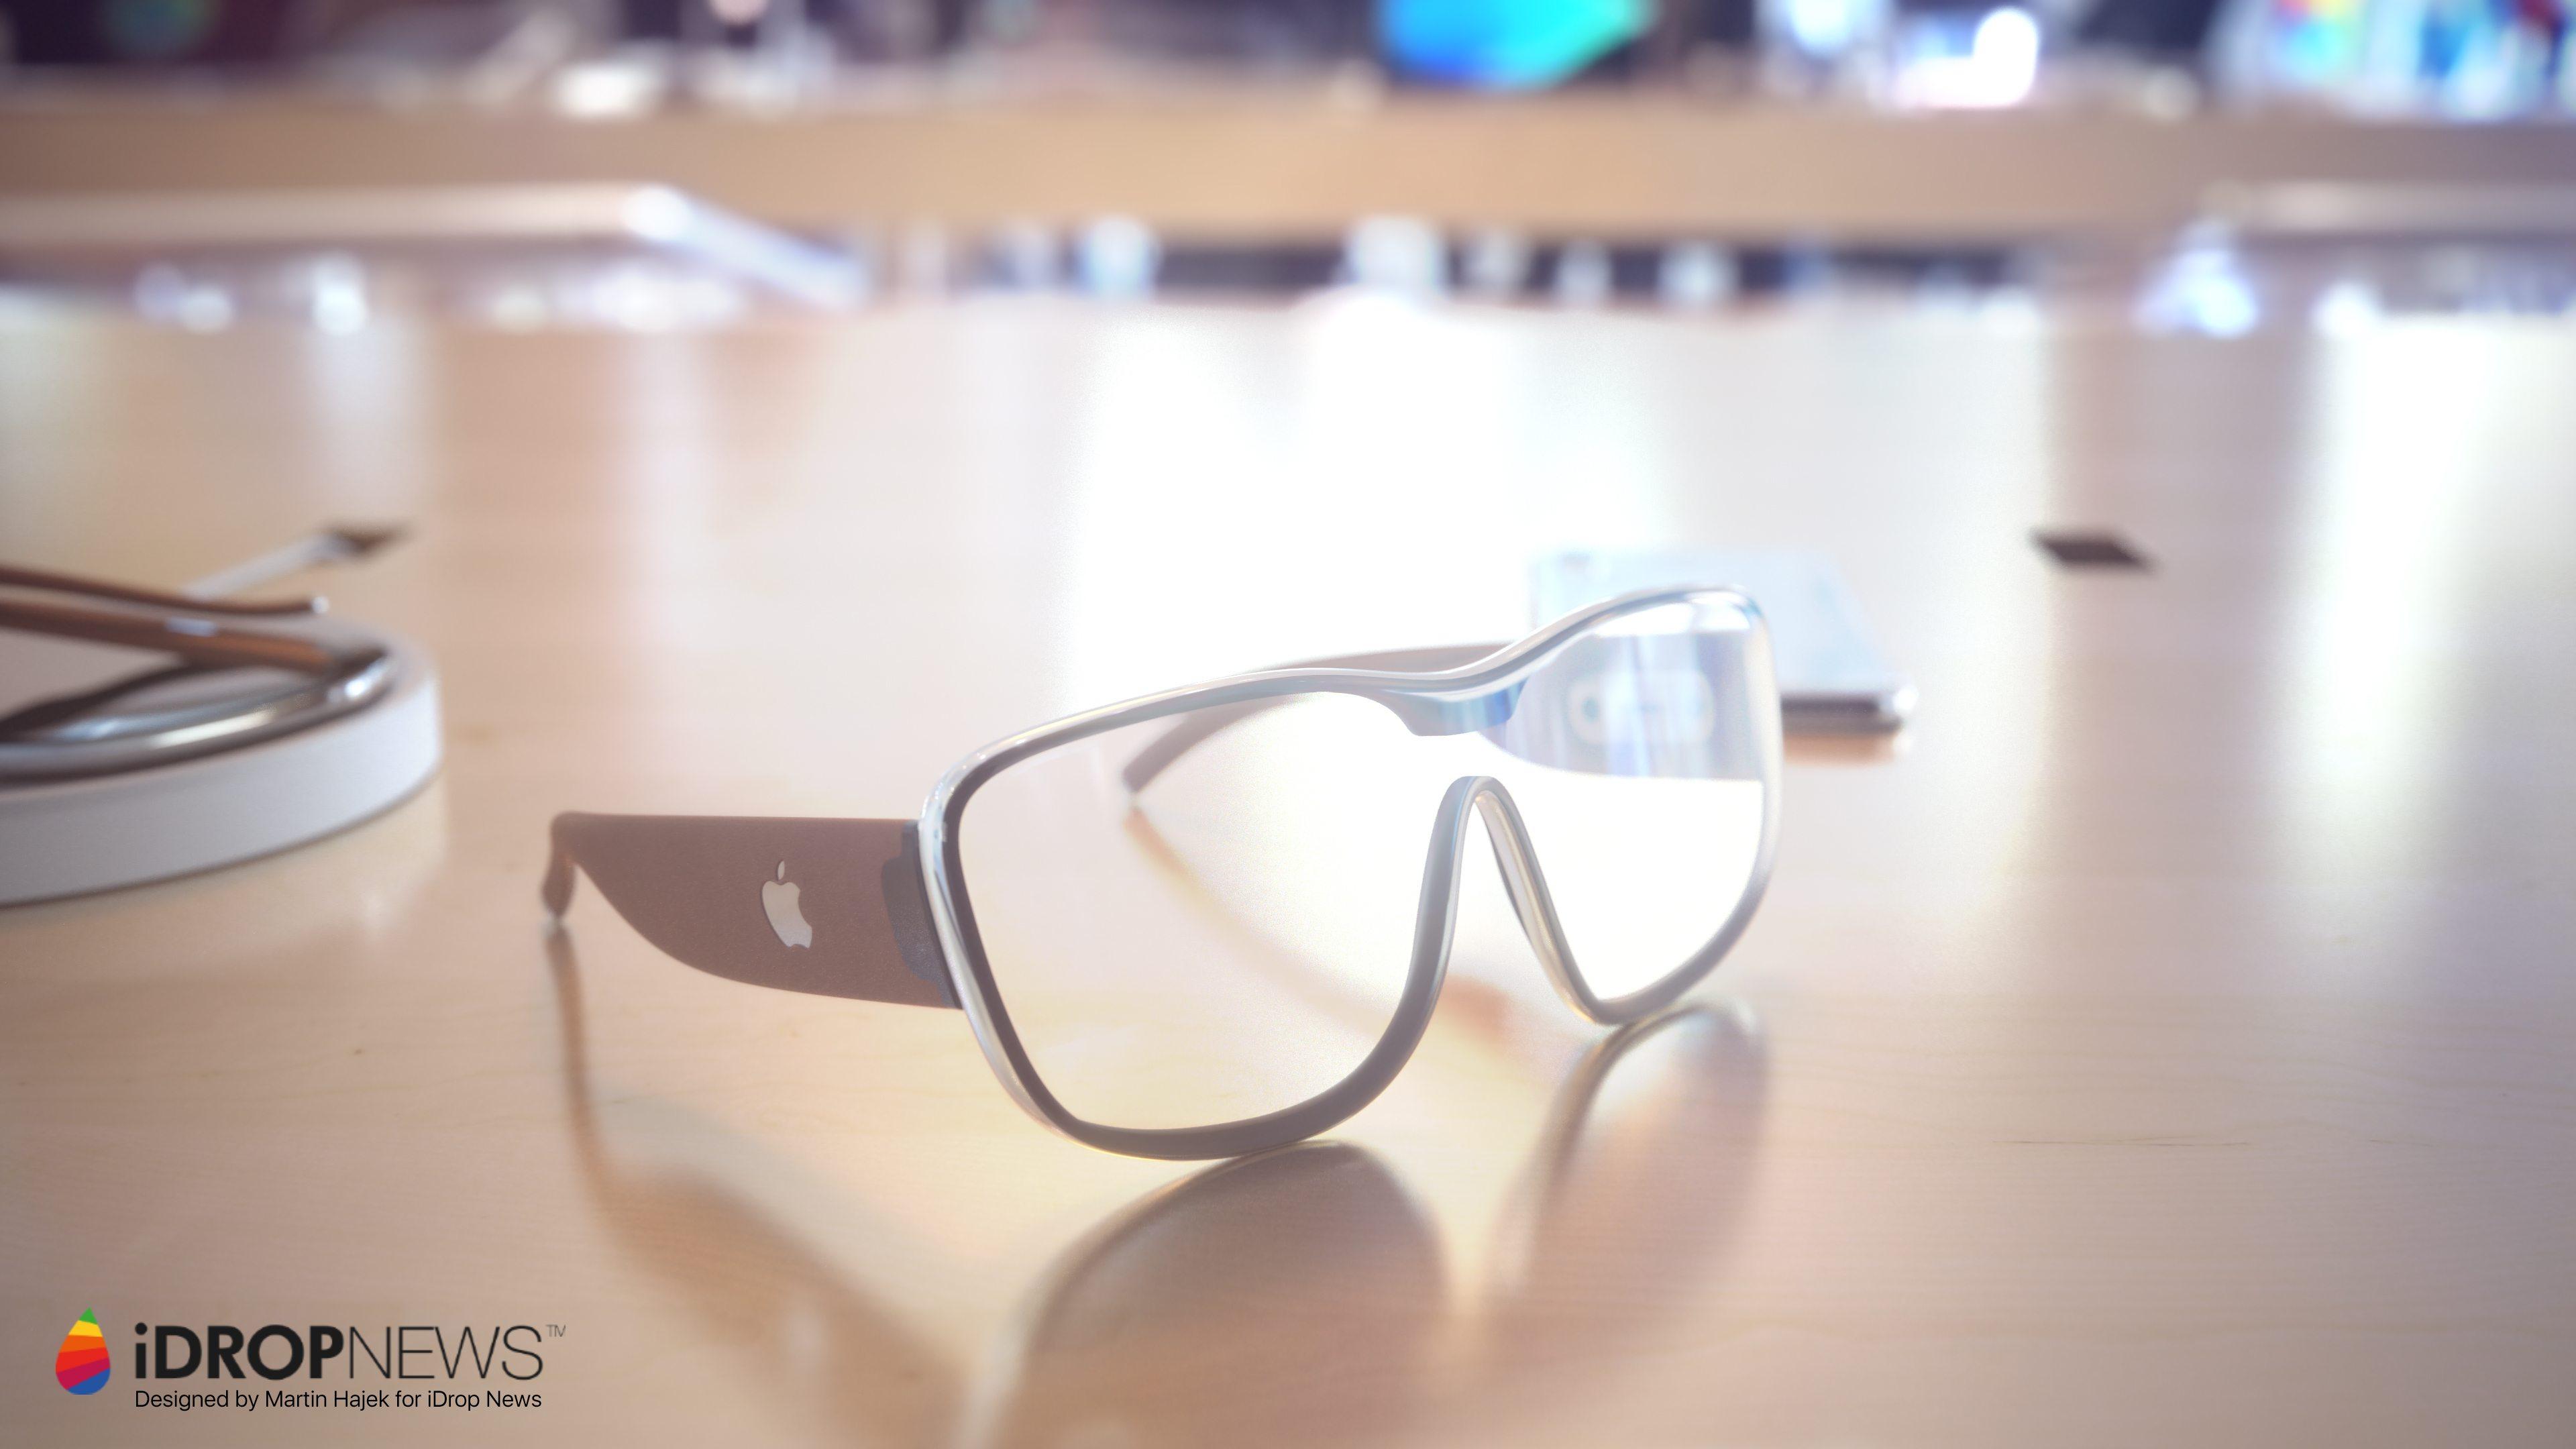 Apple sjell syze me këtë çmim